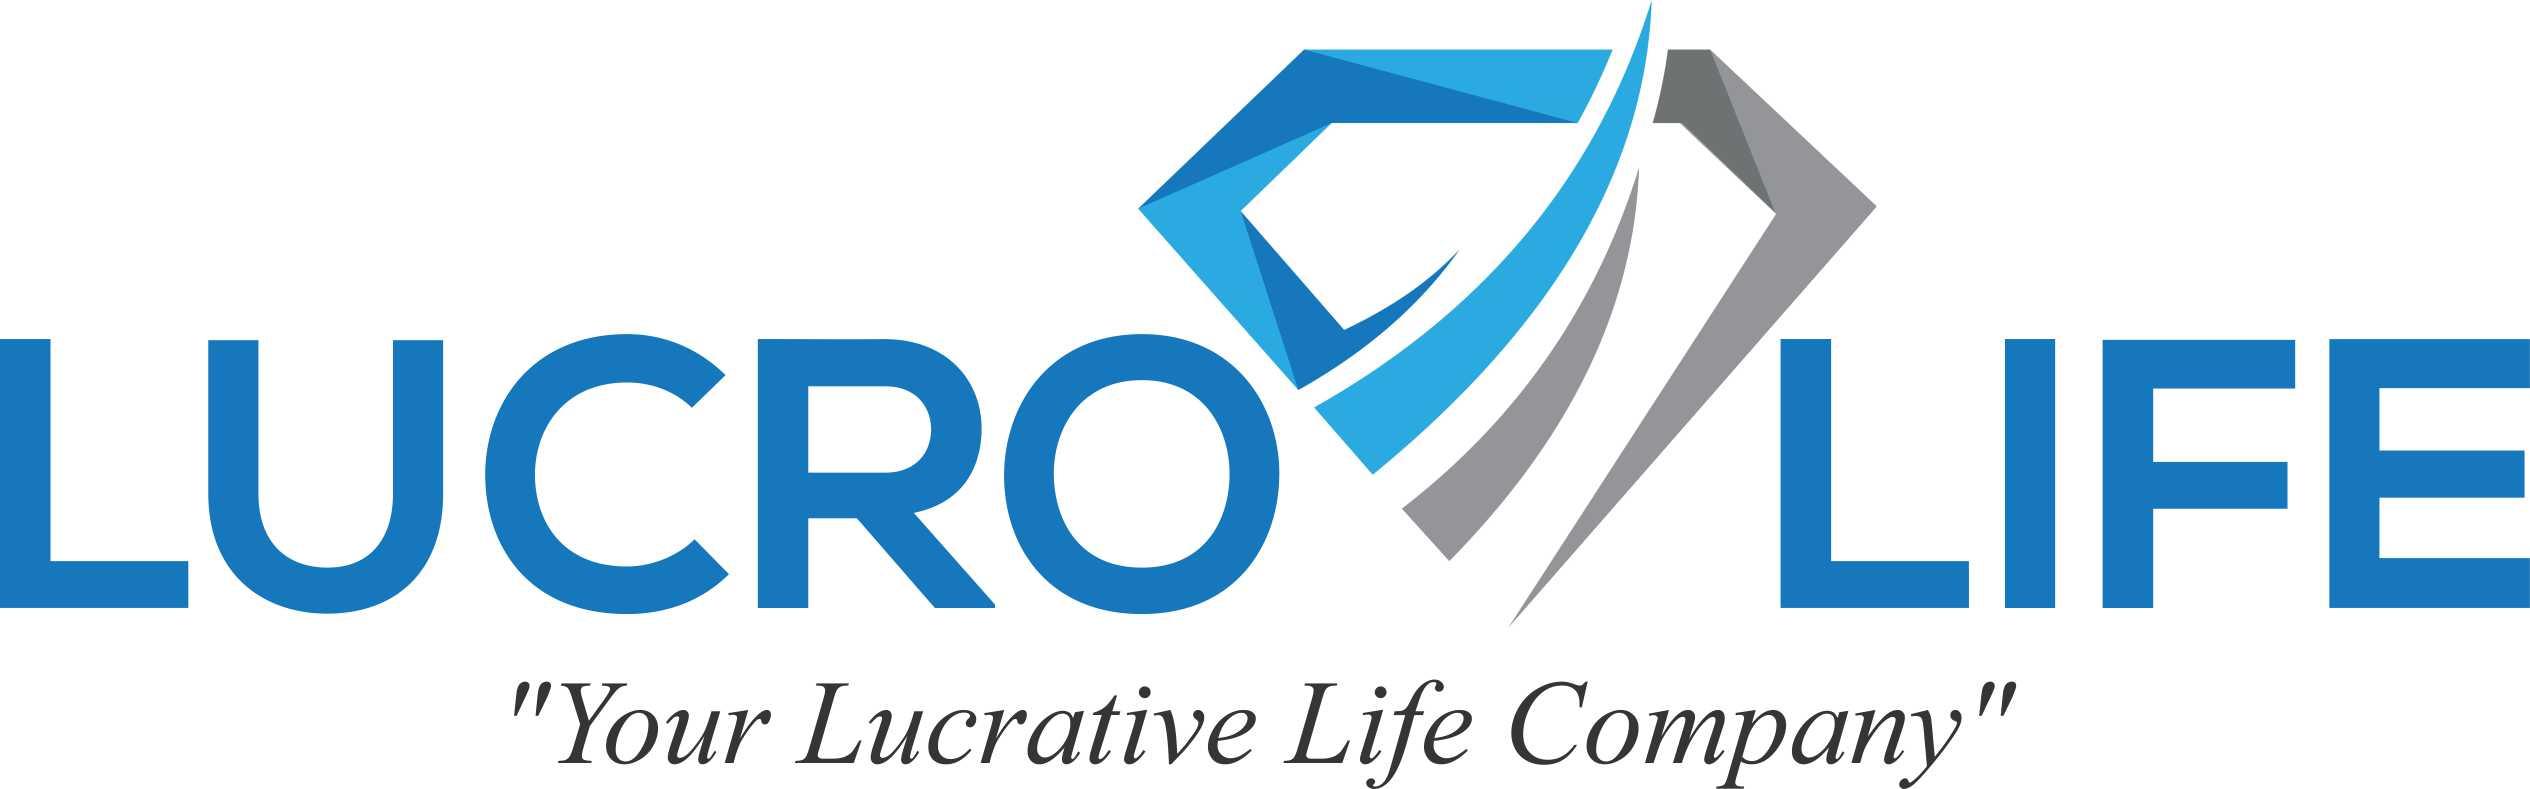 Welcome to Lucro Life University